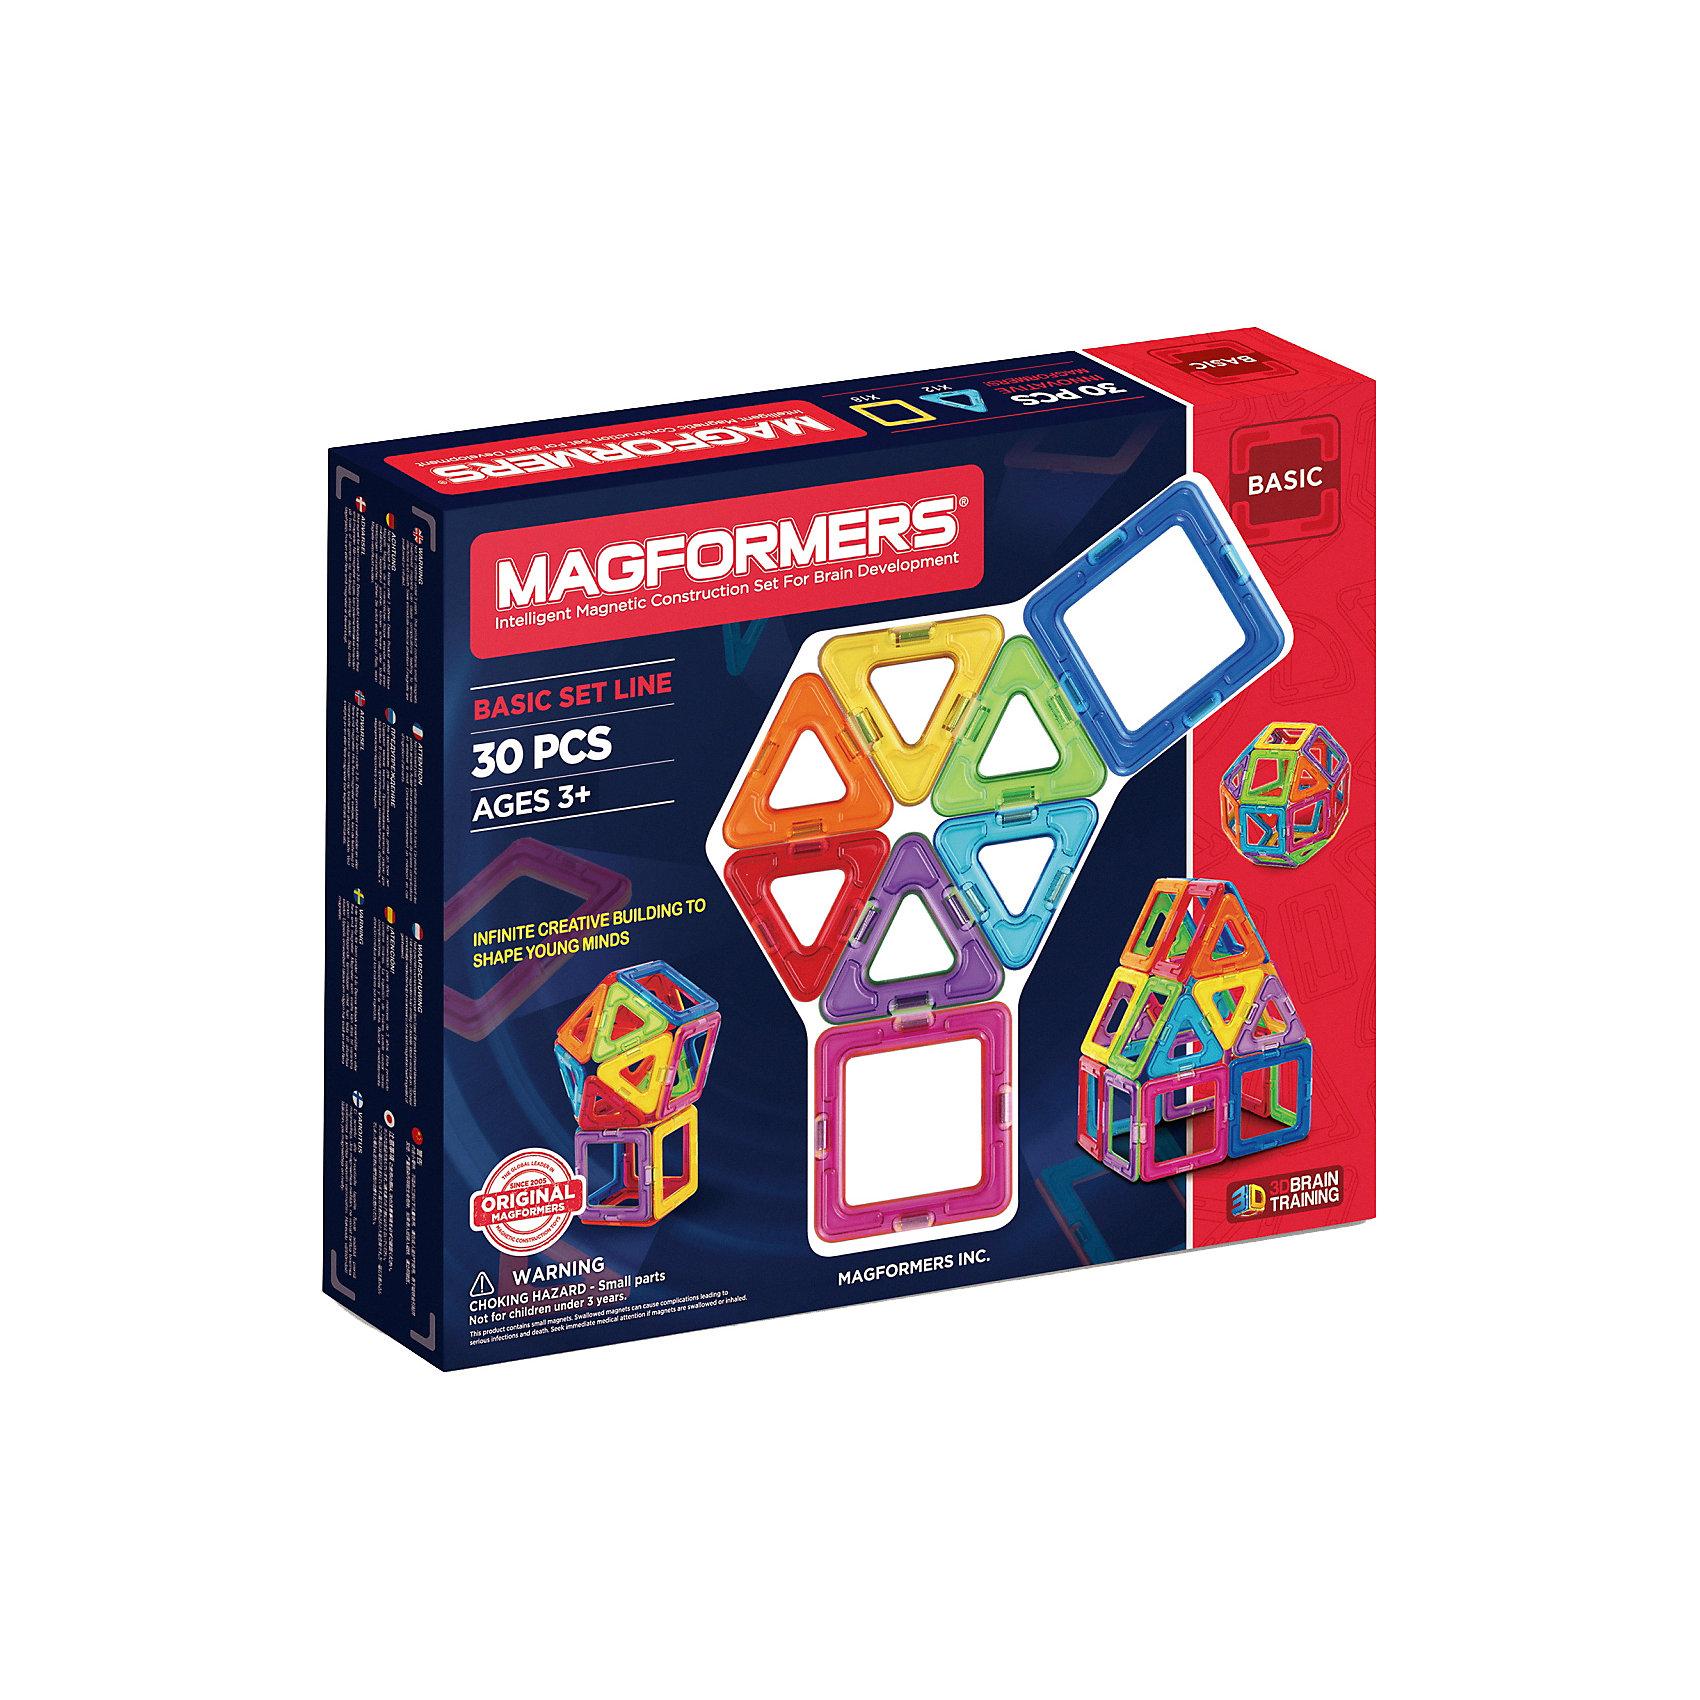 MAGFORMERS Магнитный конструктор, 30 деталей, MAGFORMERS guide craft магнитный конструктор better builders career people